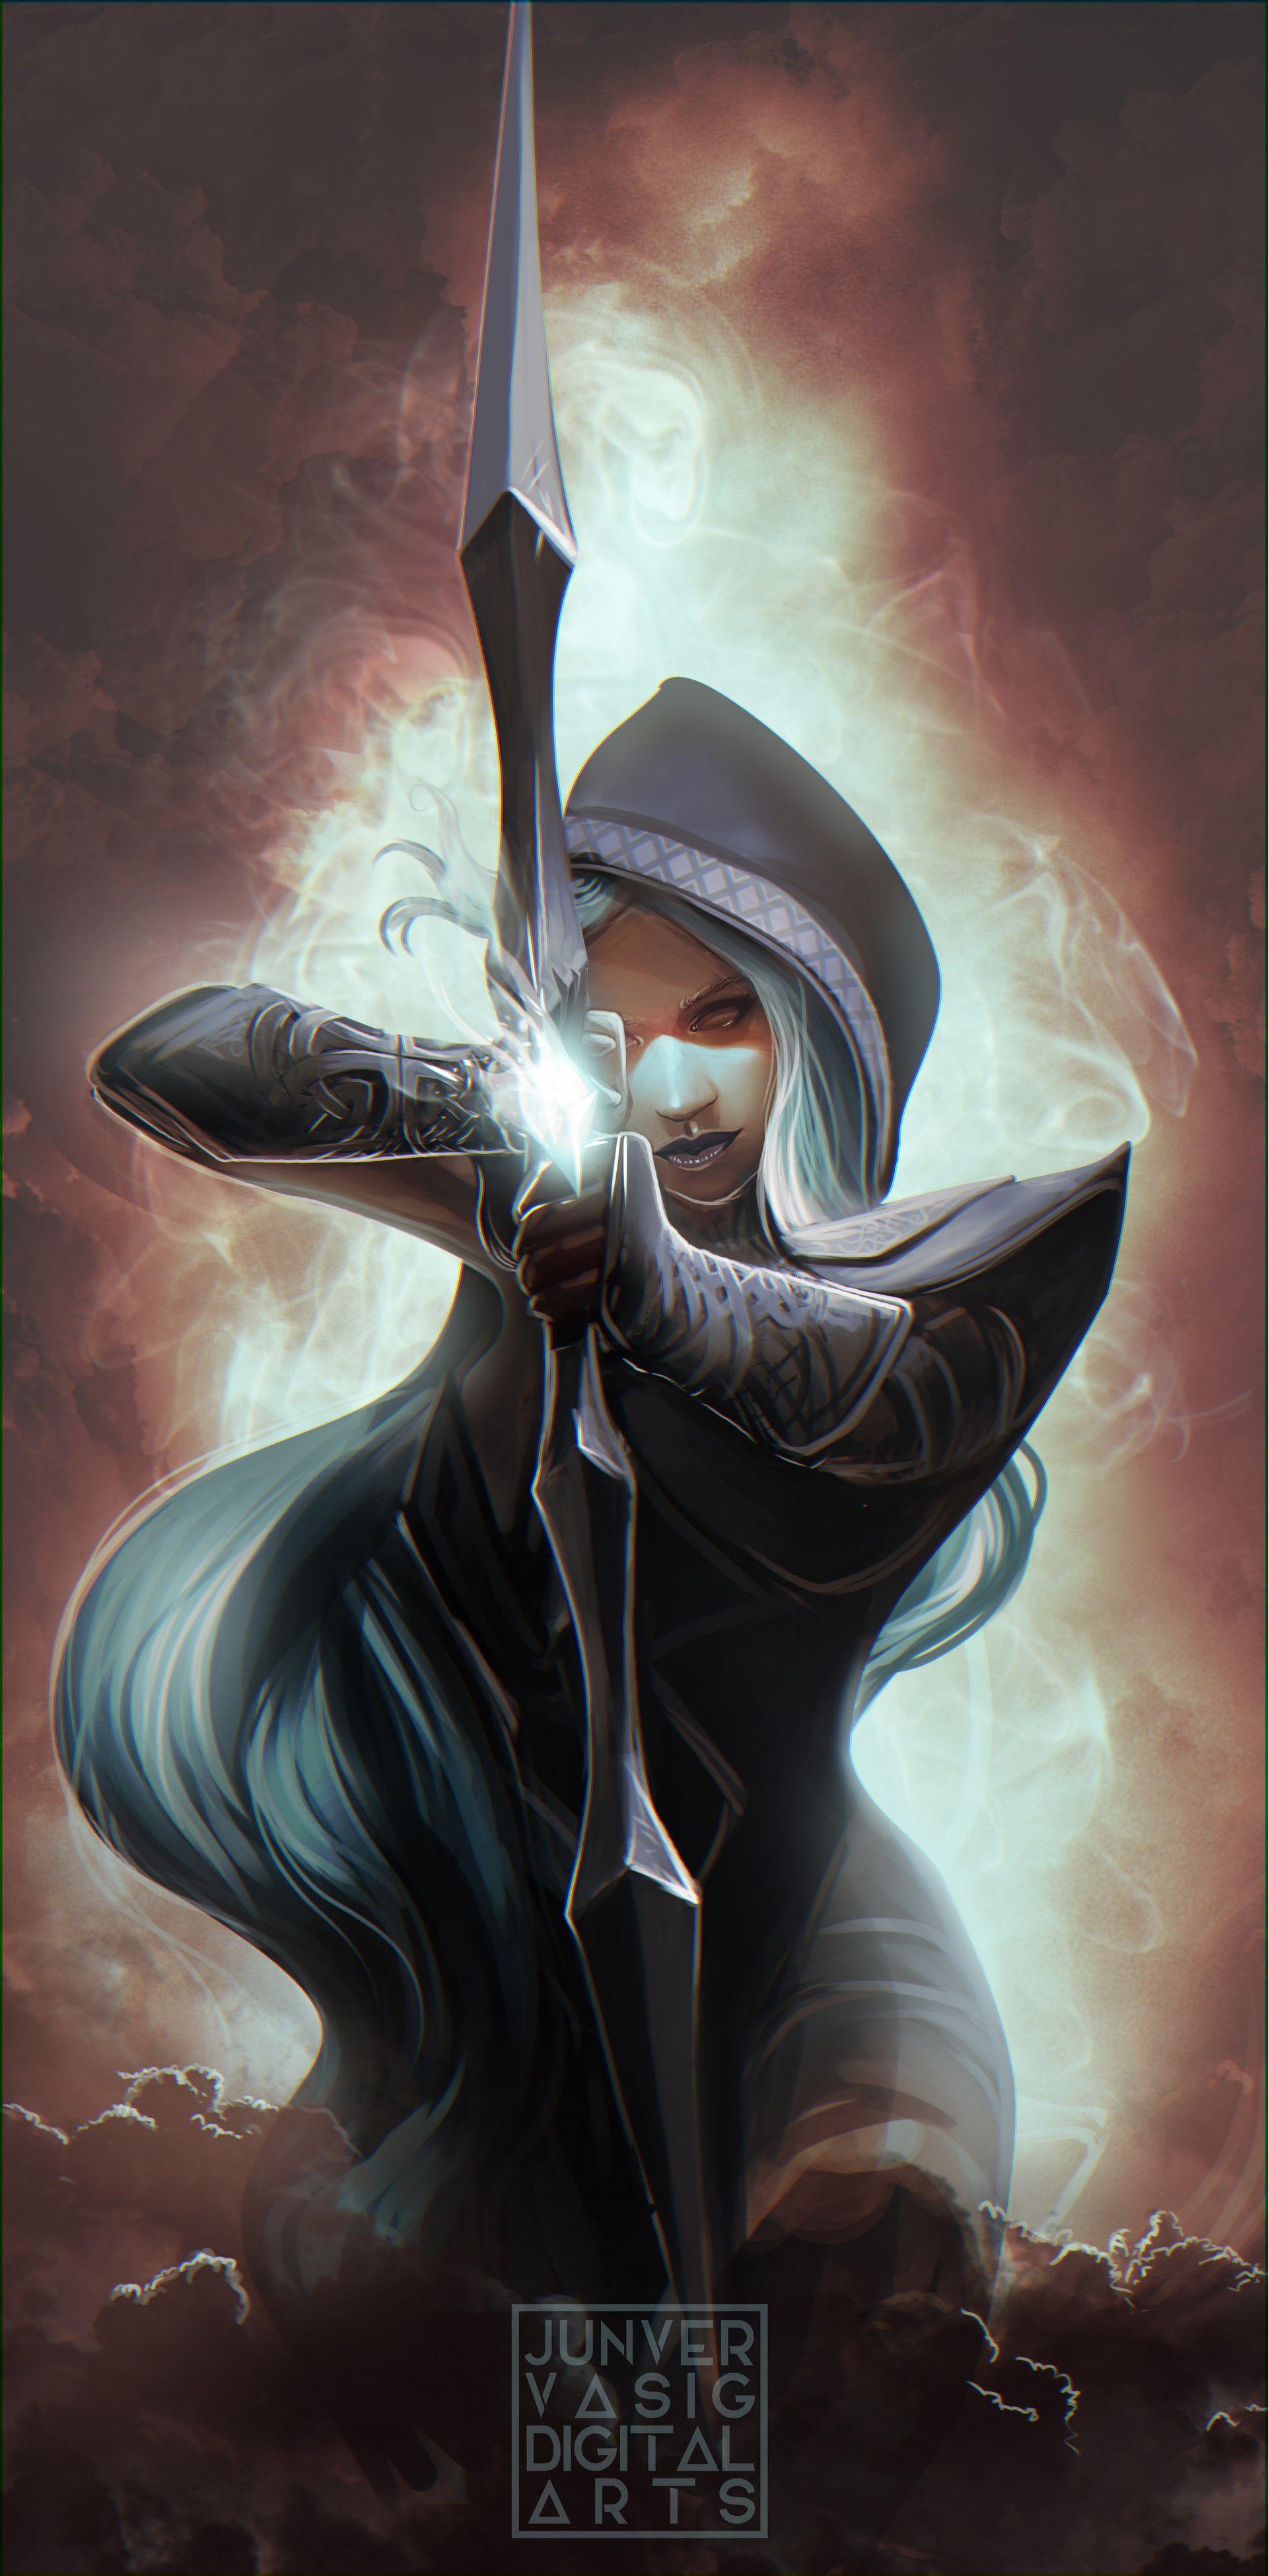 ArtStation - Drow Ranger of DOTA2, Junver Vasig | Fantasy art, Fantasy  artwork, Fantasy